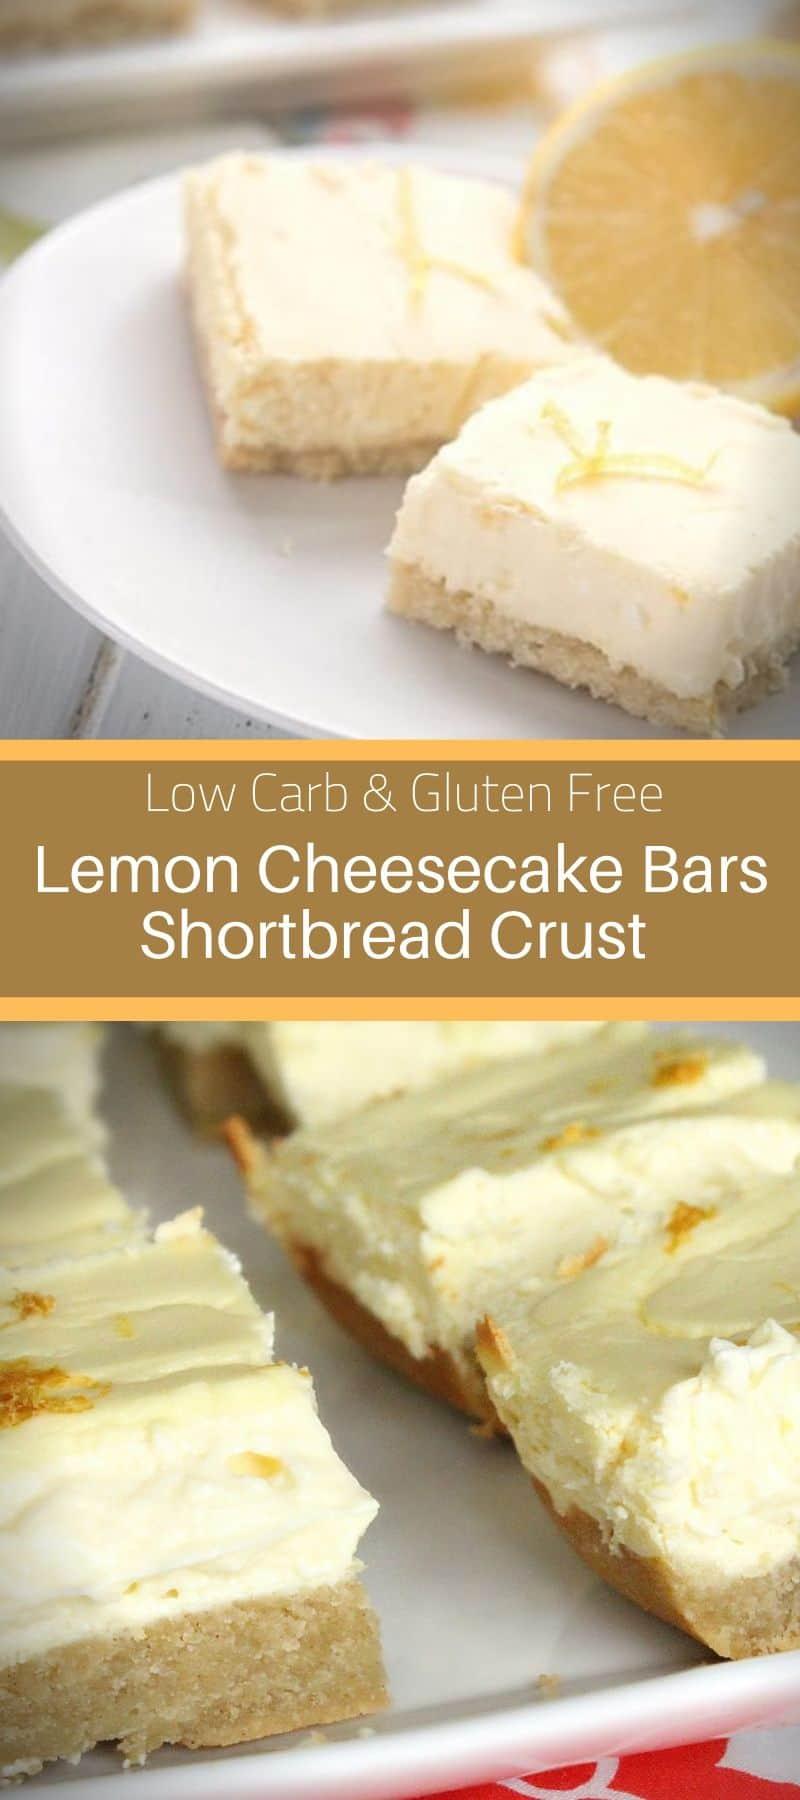 Low Carb Lemon Cheesecake Bars Shortbread Crust Gluten Free